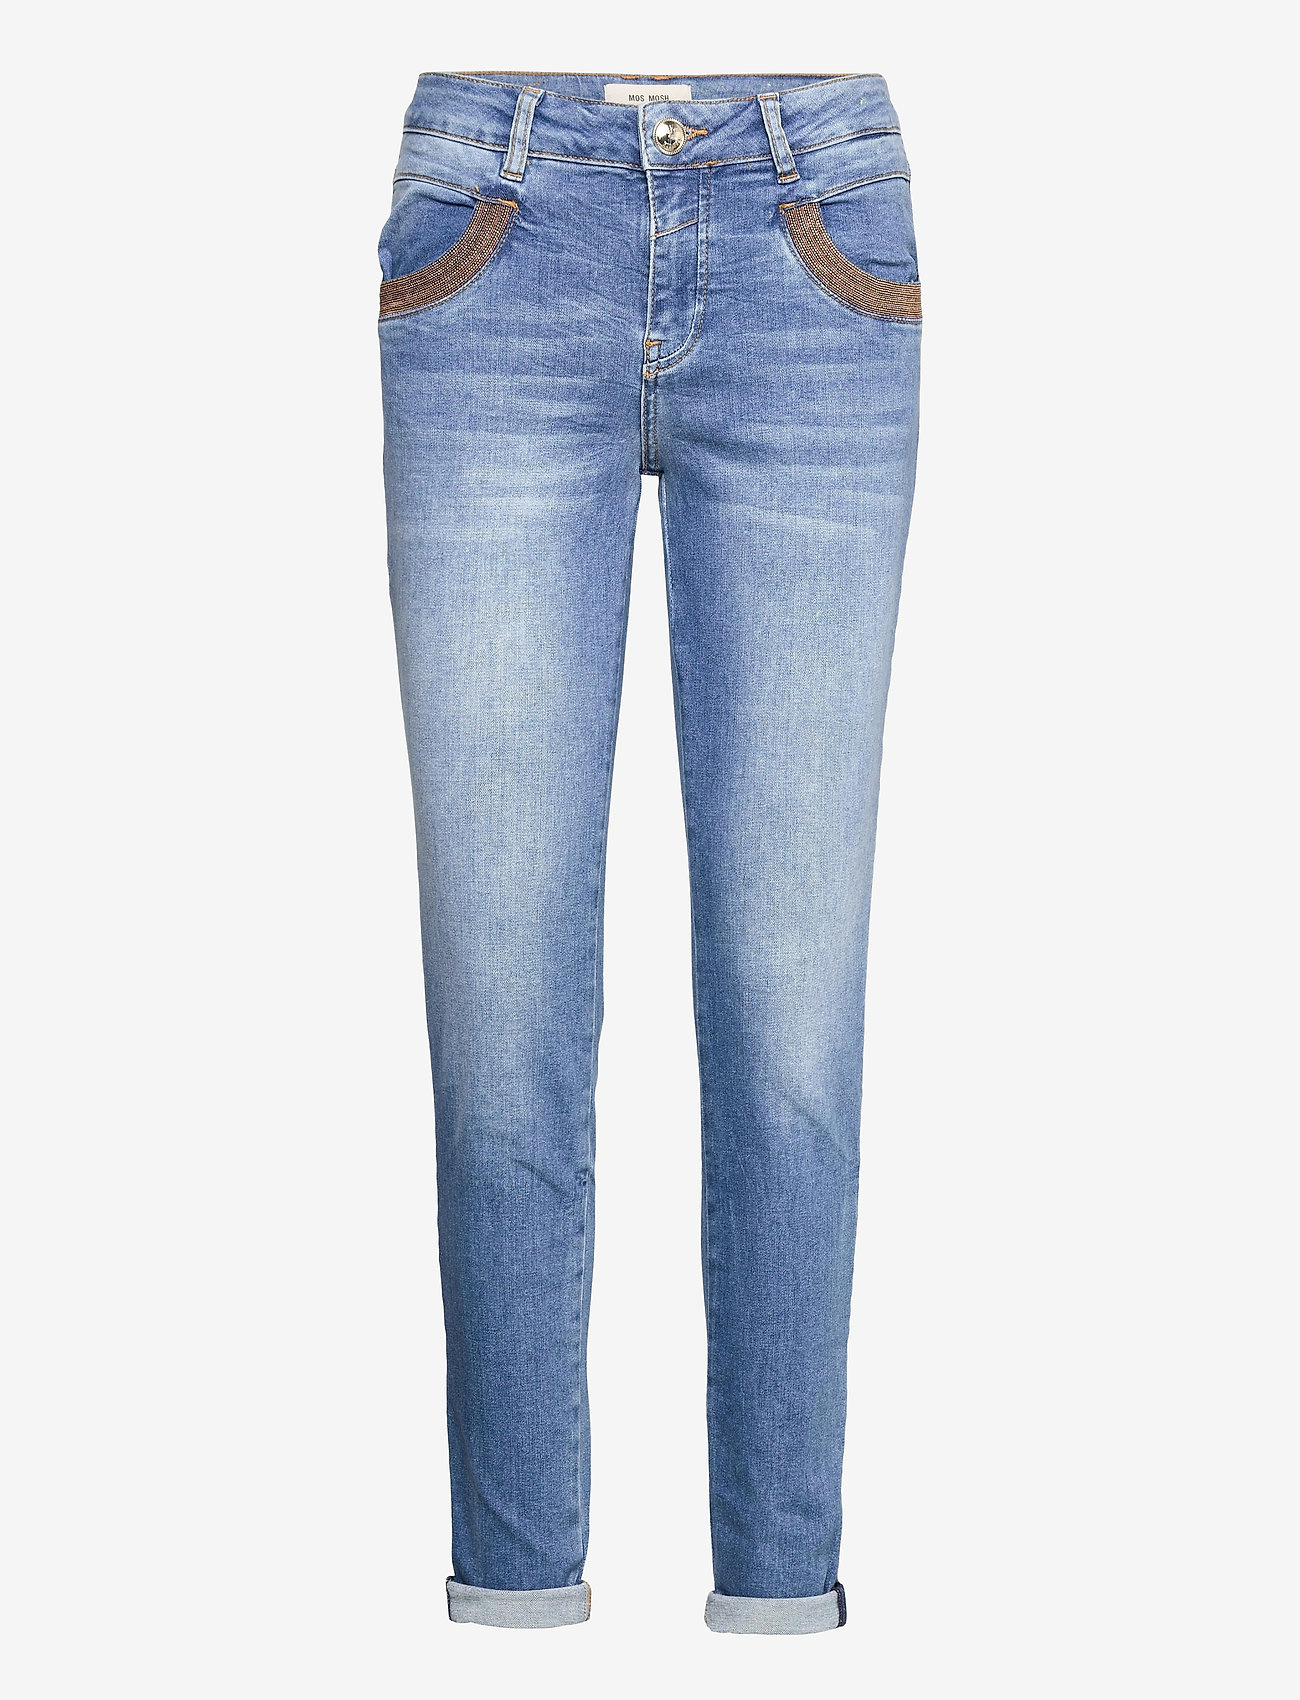 MOS MOSH - Naomi Amber Jeans - slim jeans - light blue - 0